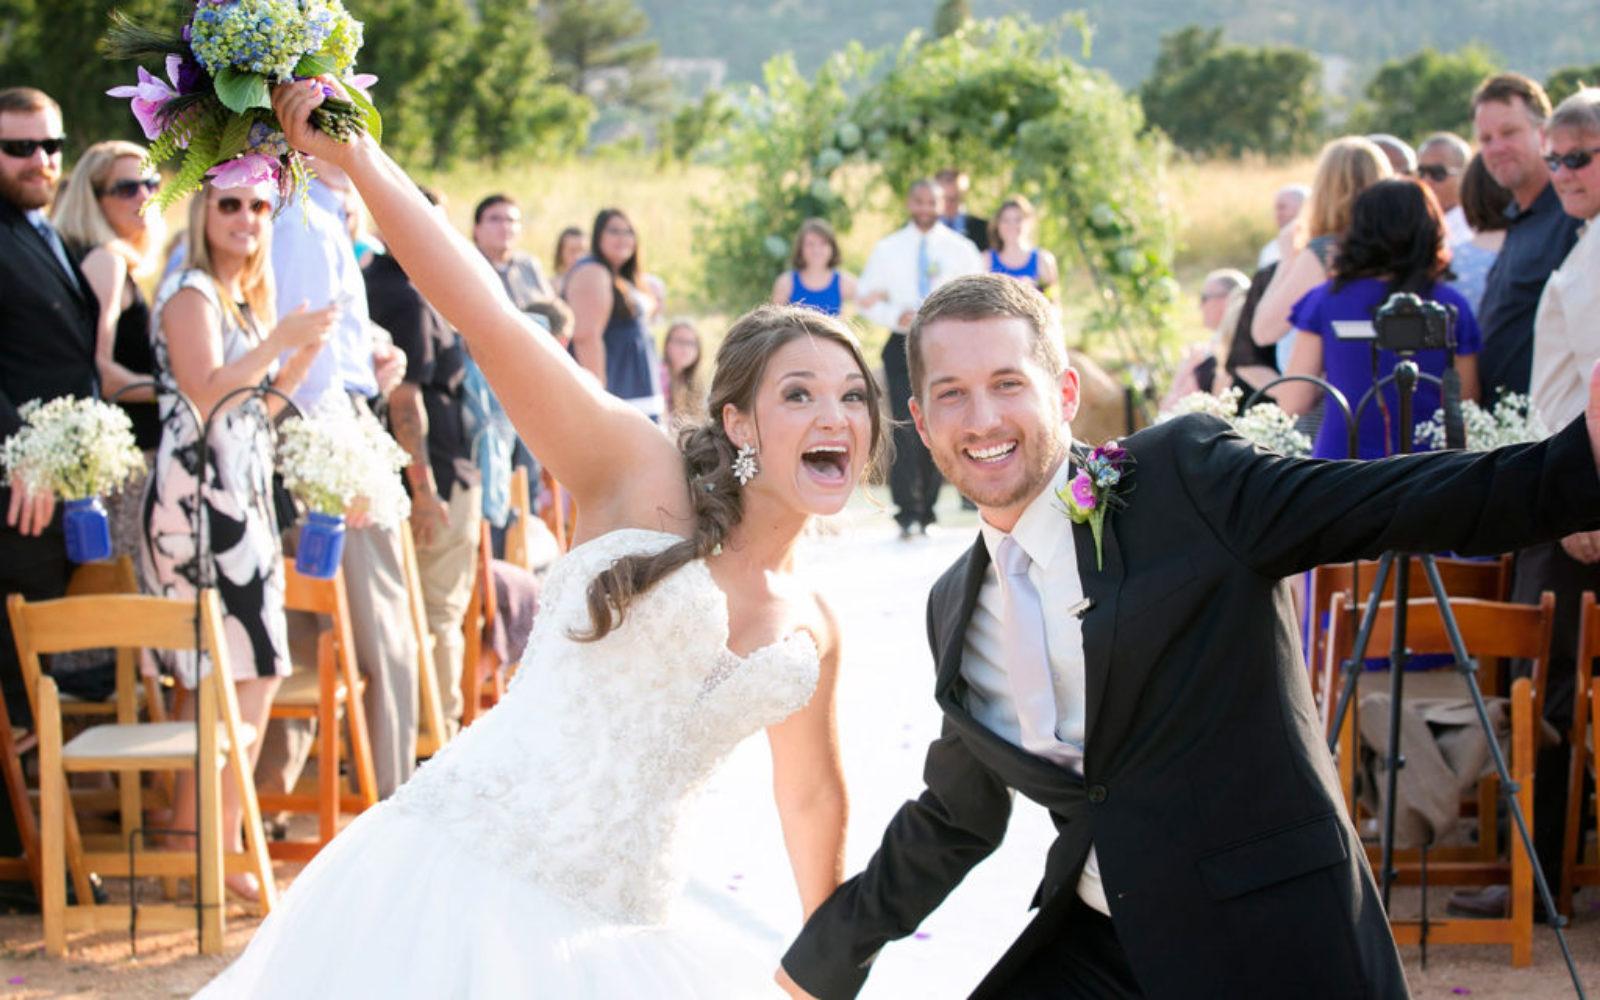 weddingphotographycoloradosprings_43-1024x640